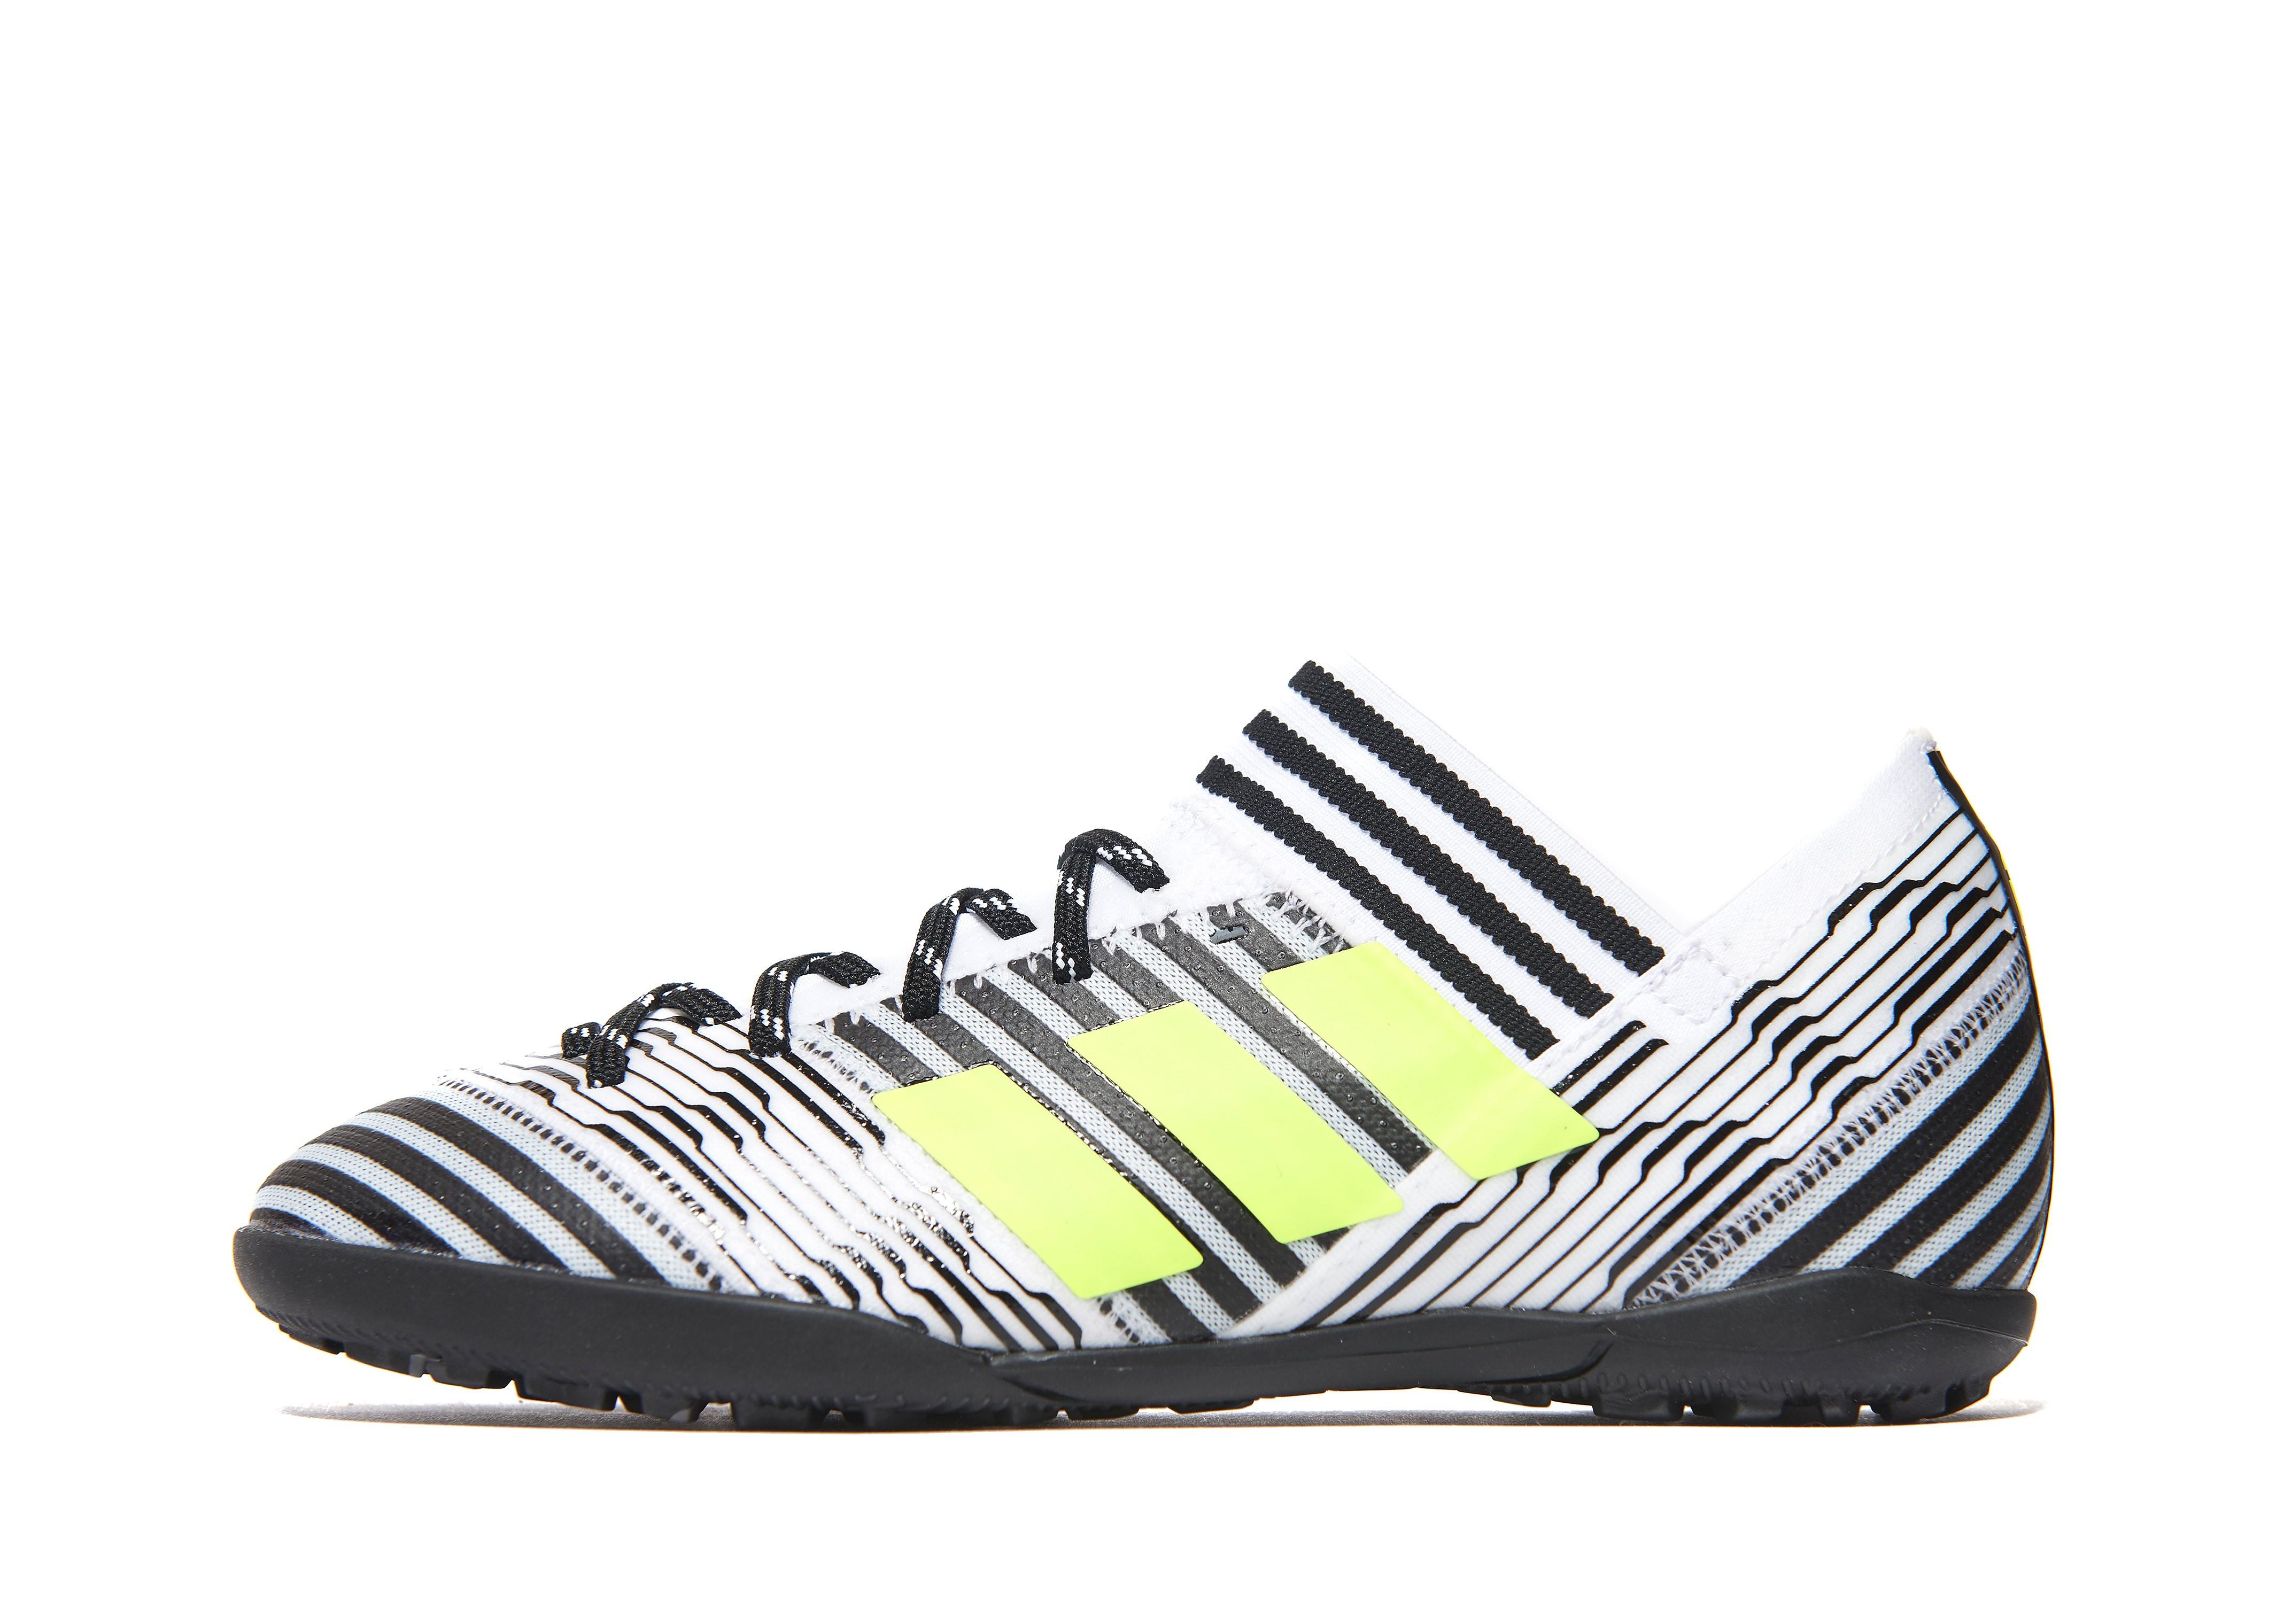 adidas Dust Storm Nemeziz Tango 17.3 Turf Children